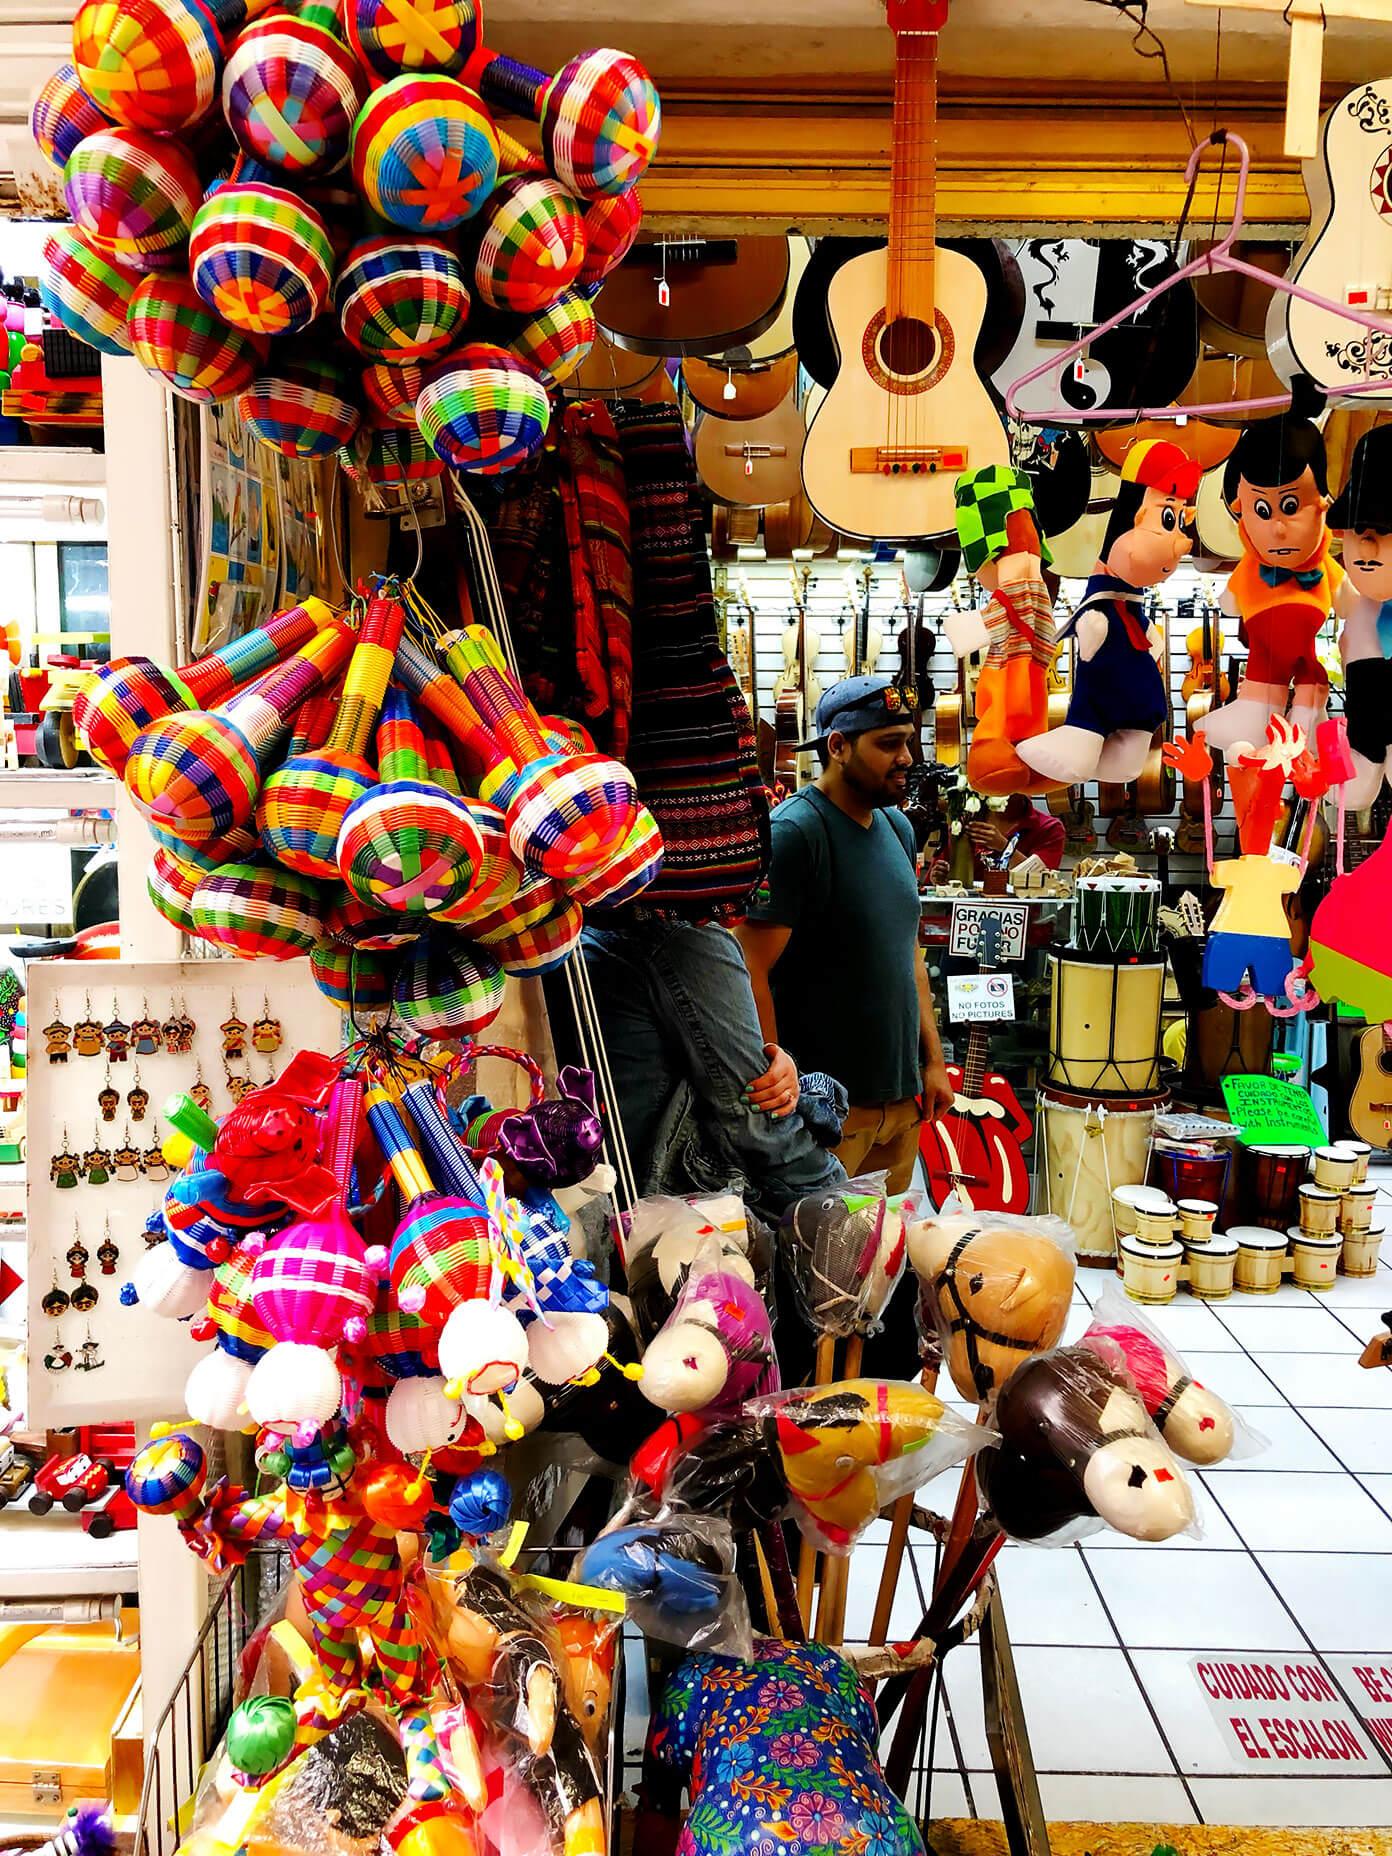 La Ciutadela Market